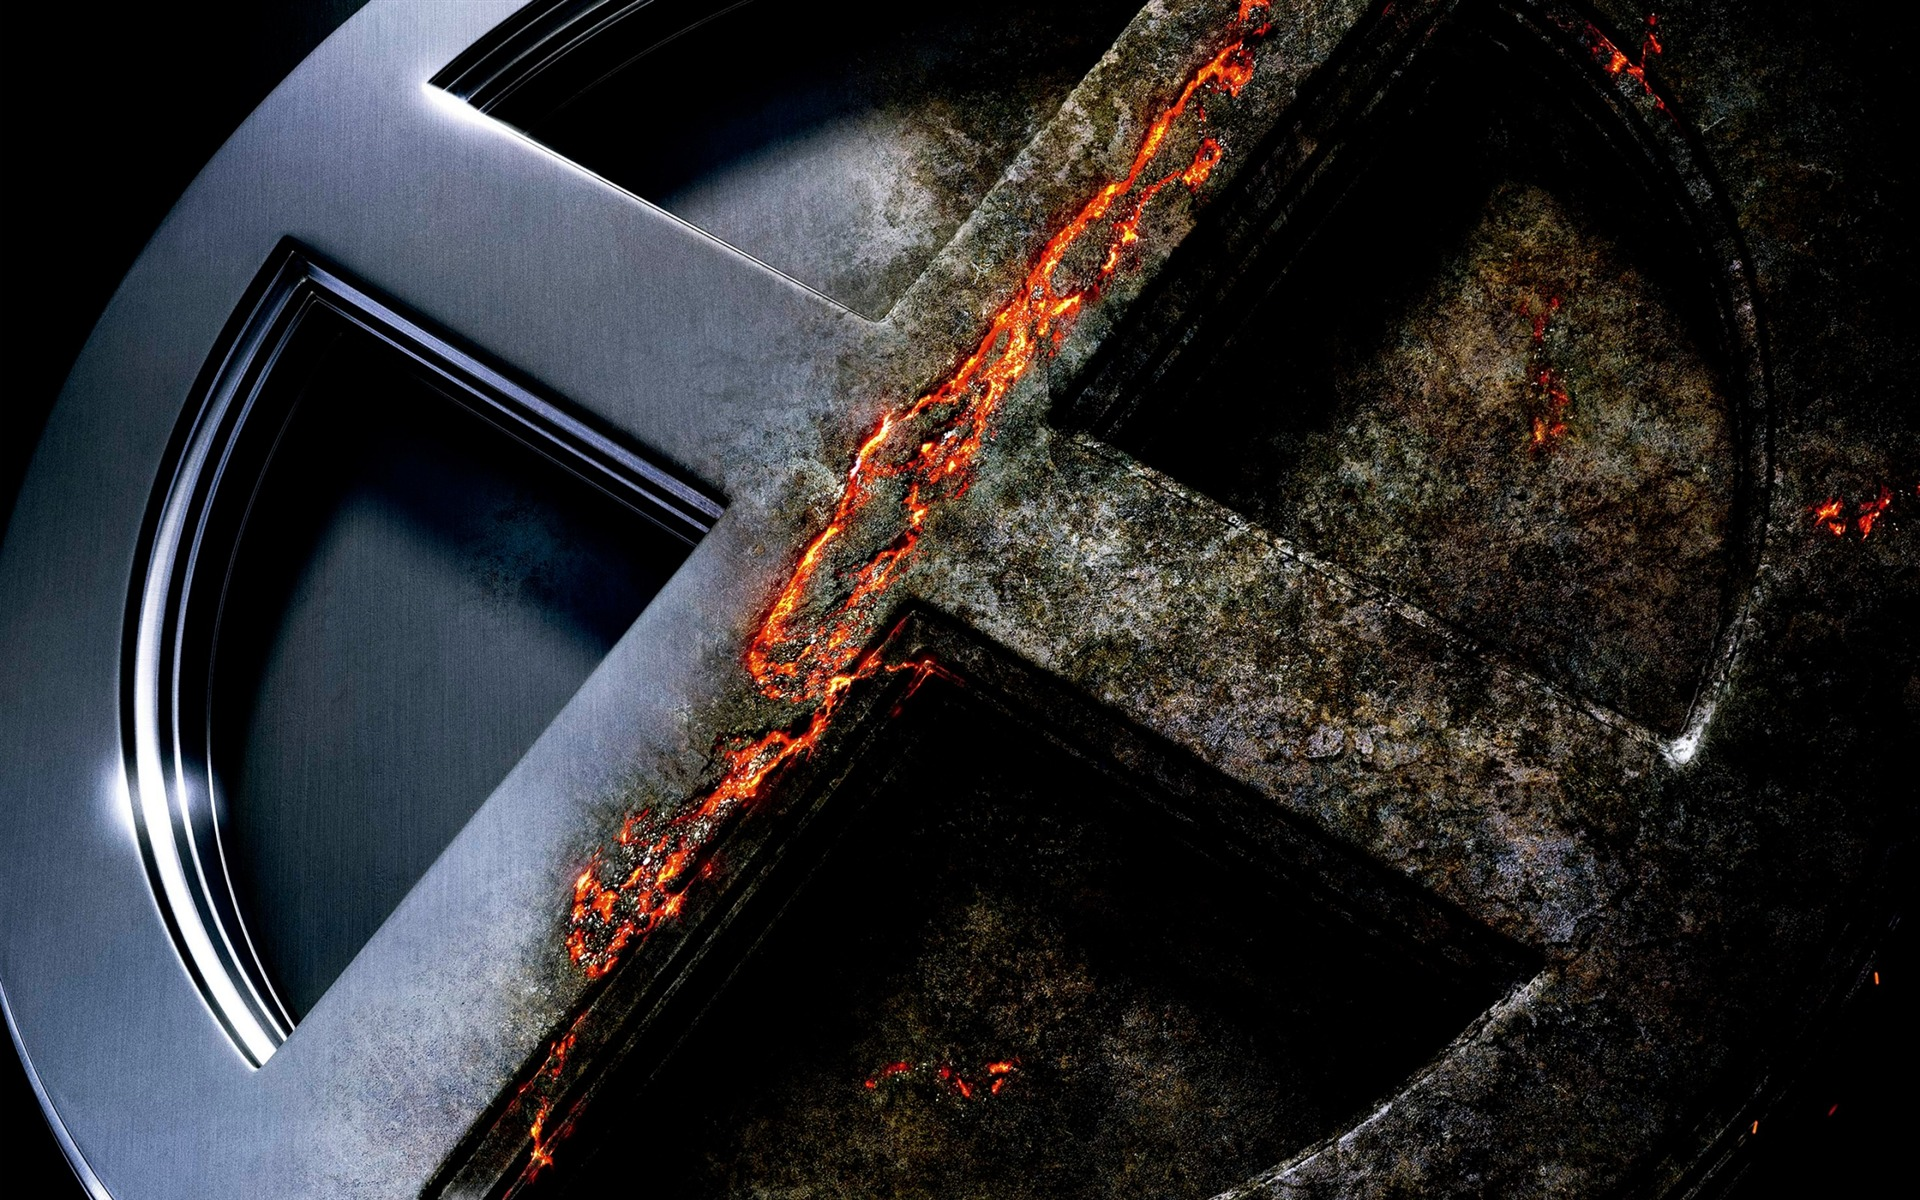 X Men Apocalypse Movie Pósters Hd Wallpaper Avance